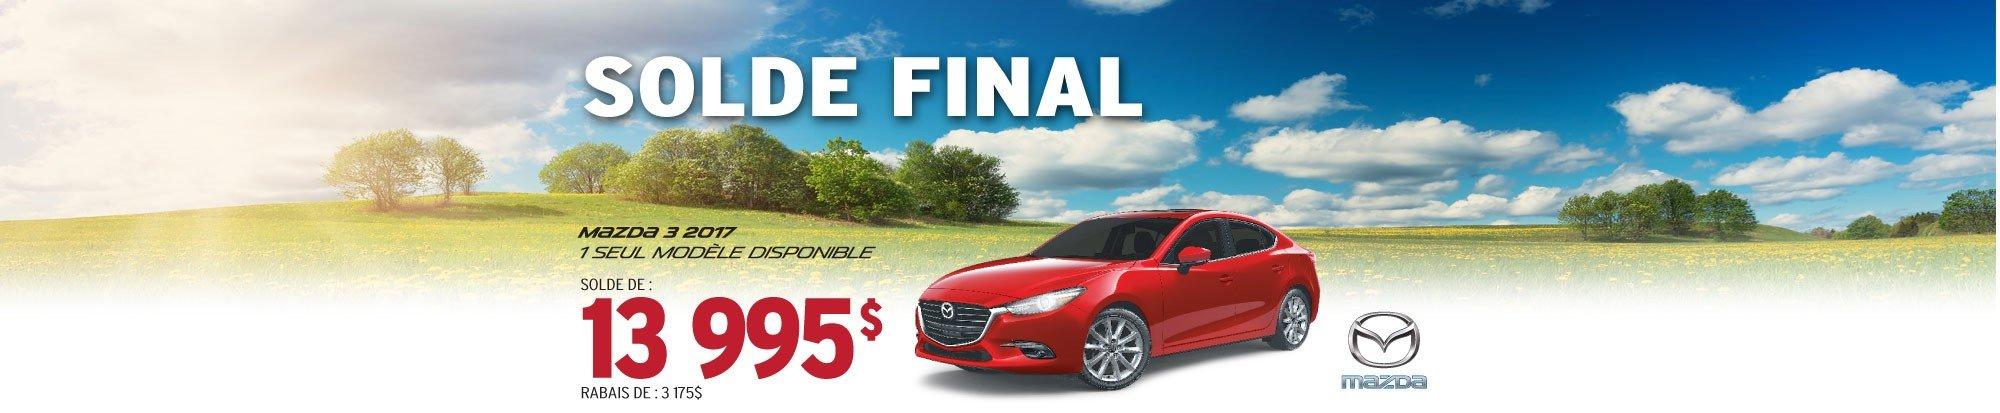 SOLDE FINAL - Mazda 3 2017